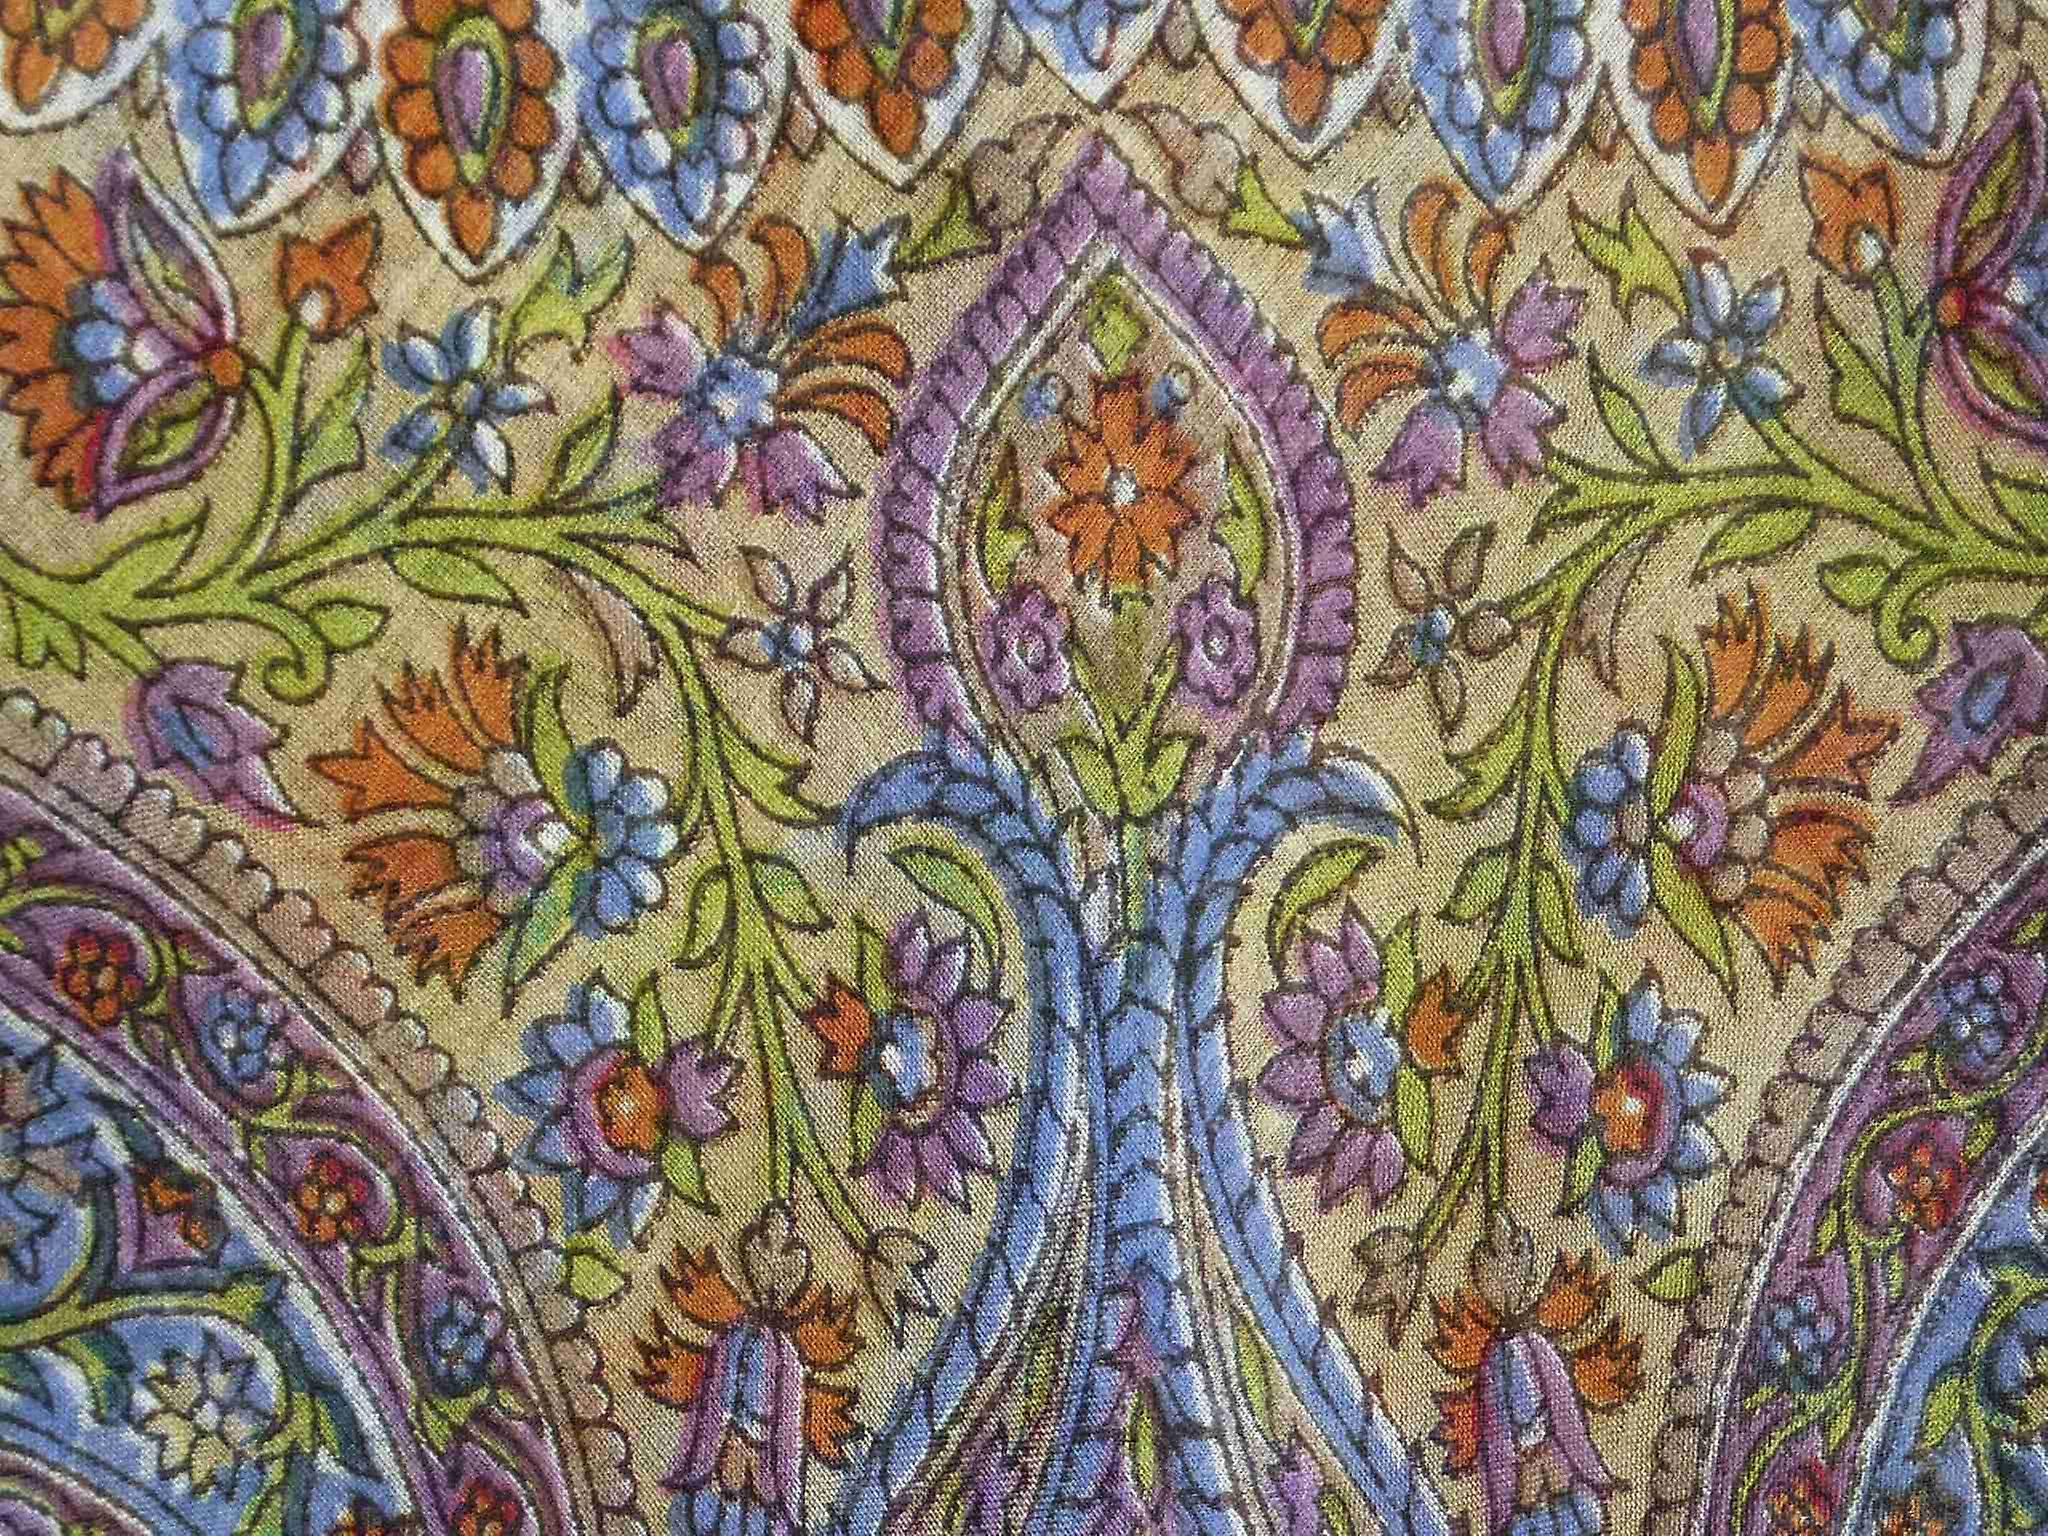 Mulberry Silk Traditional Square Scarf Chiti Ecru by Pashmina & Silk